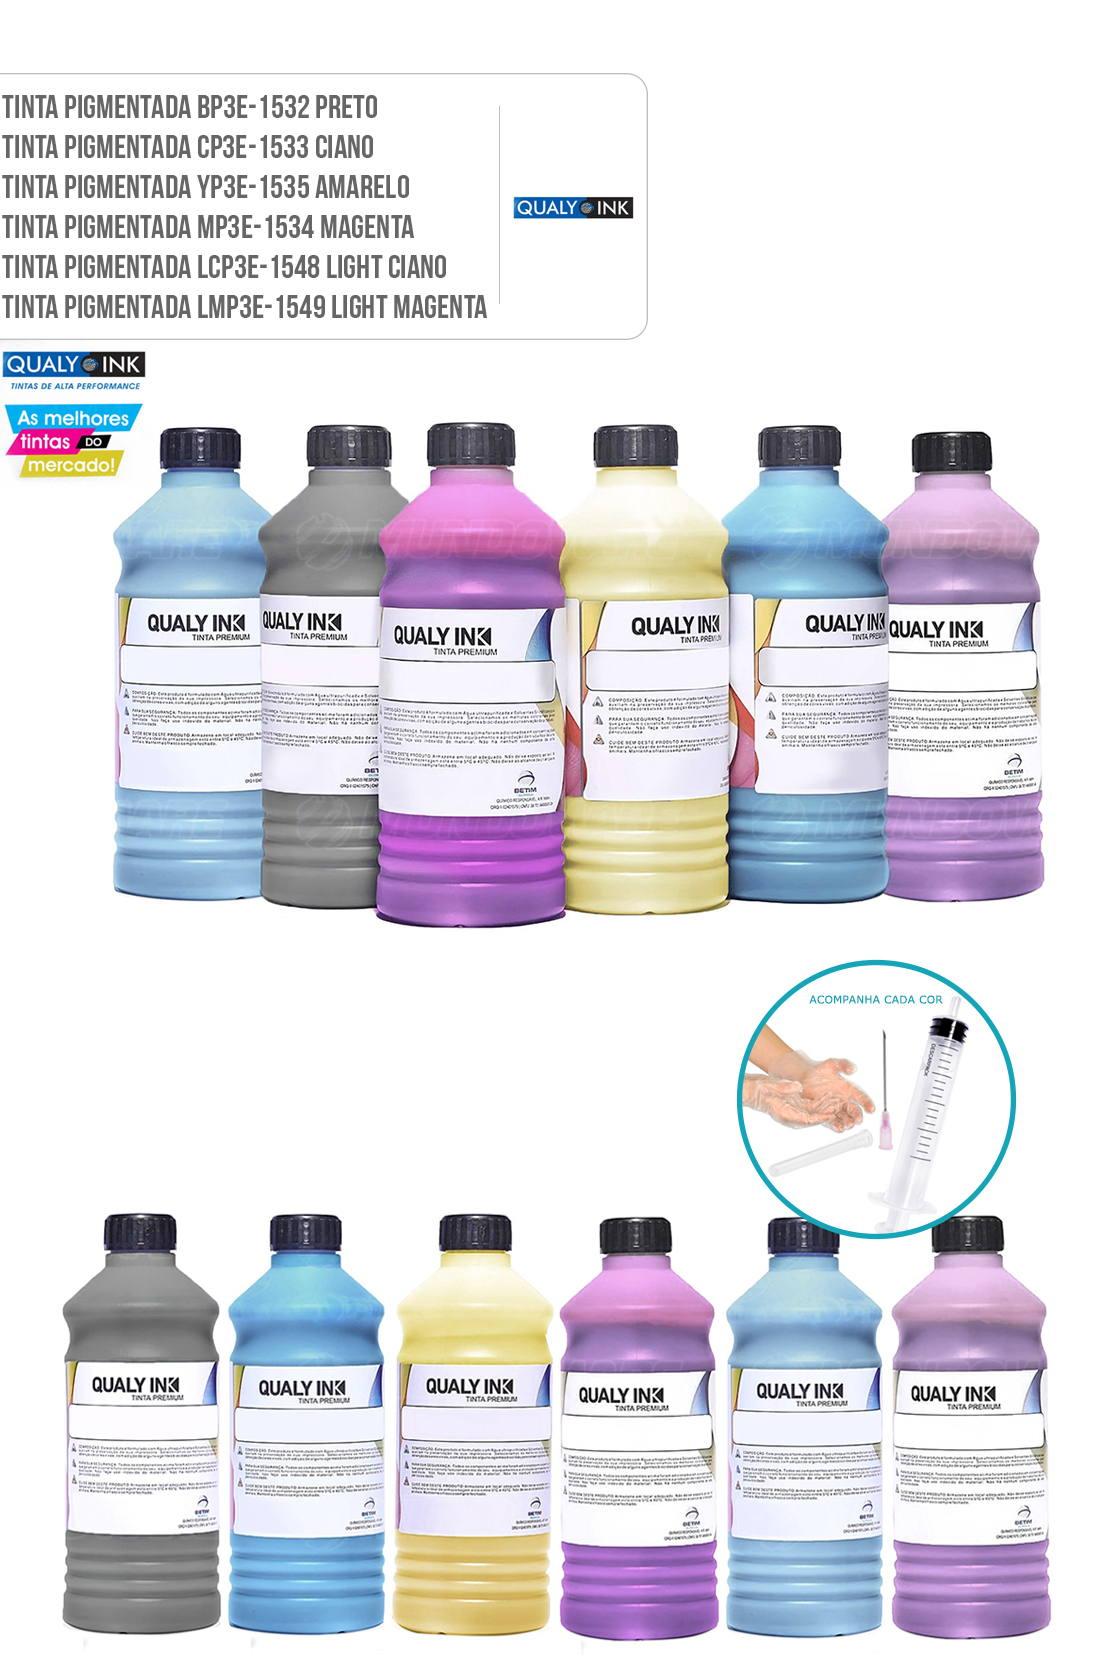 Kit 6 Cores de Tinta Qualy-Ink para Epson EcoTank L800 L805 L810 L850 L1800 6 Litros